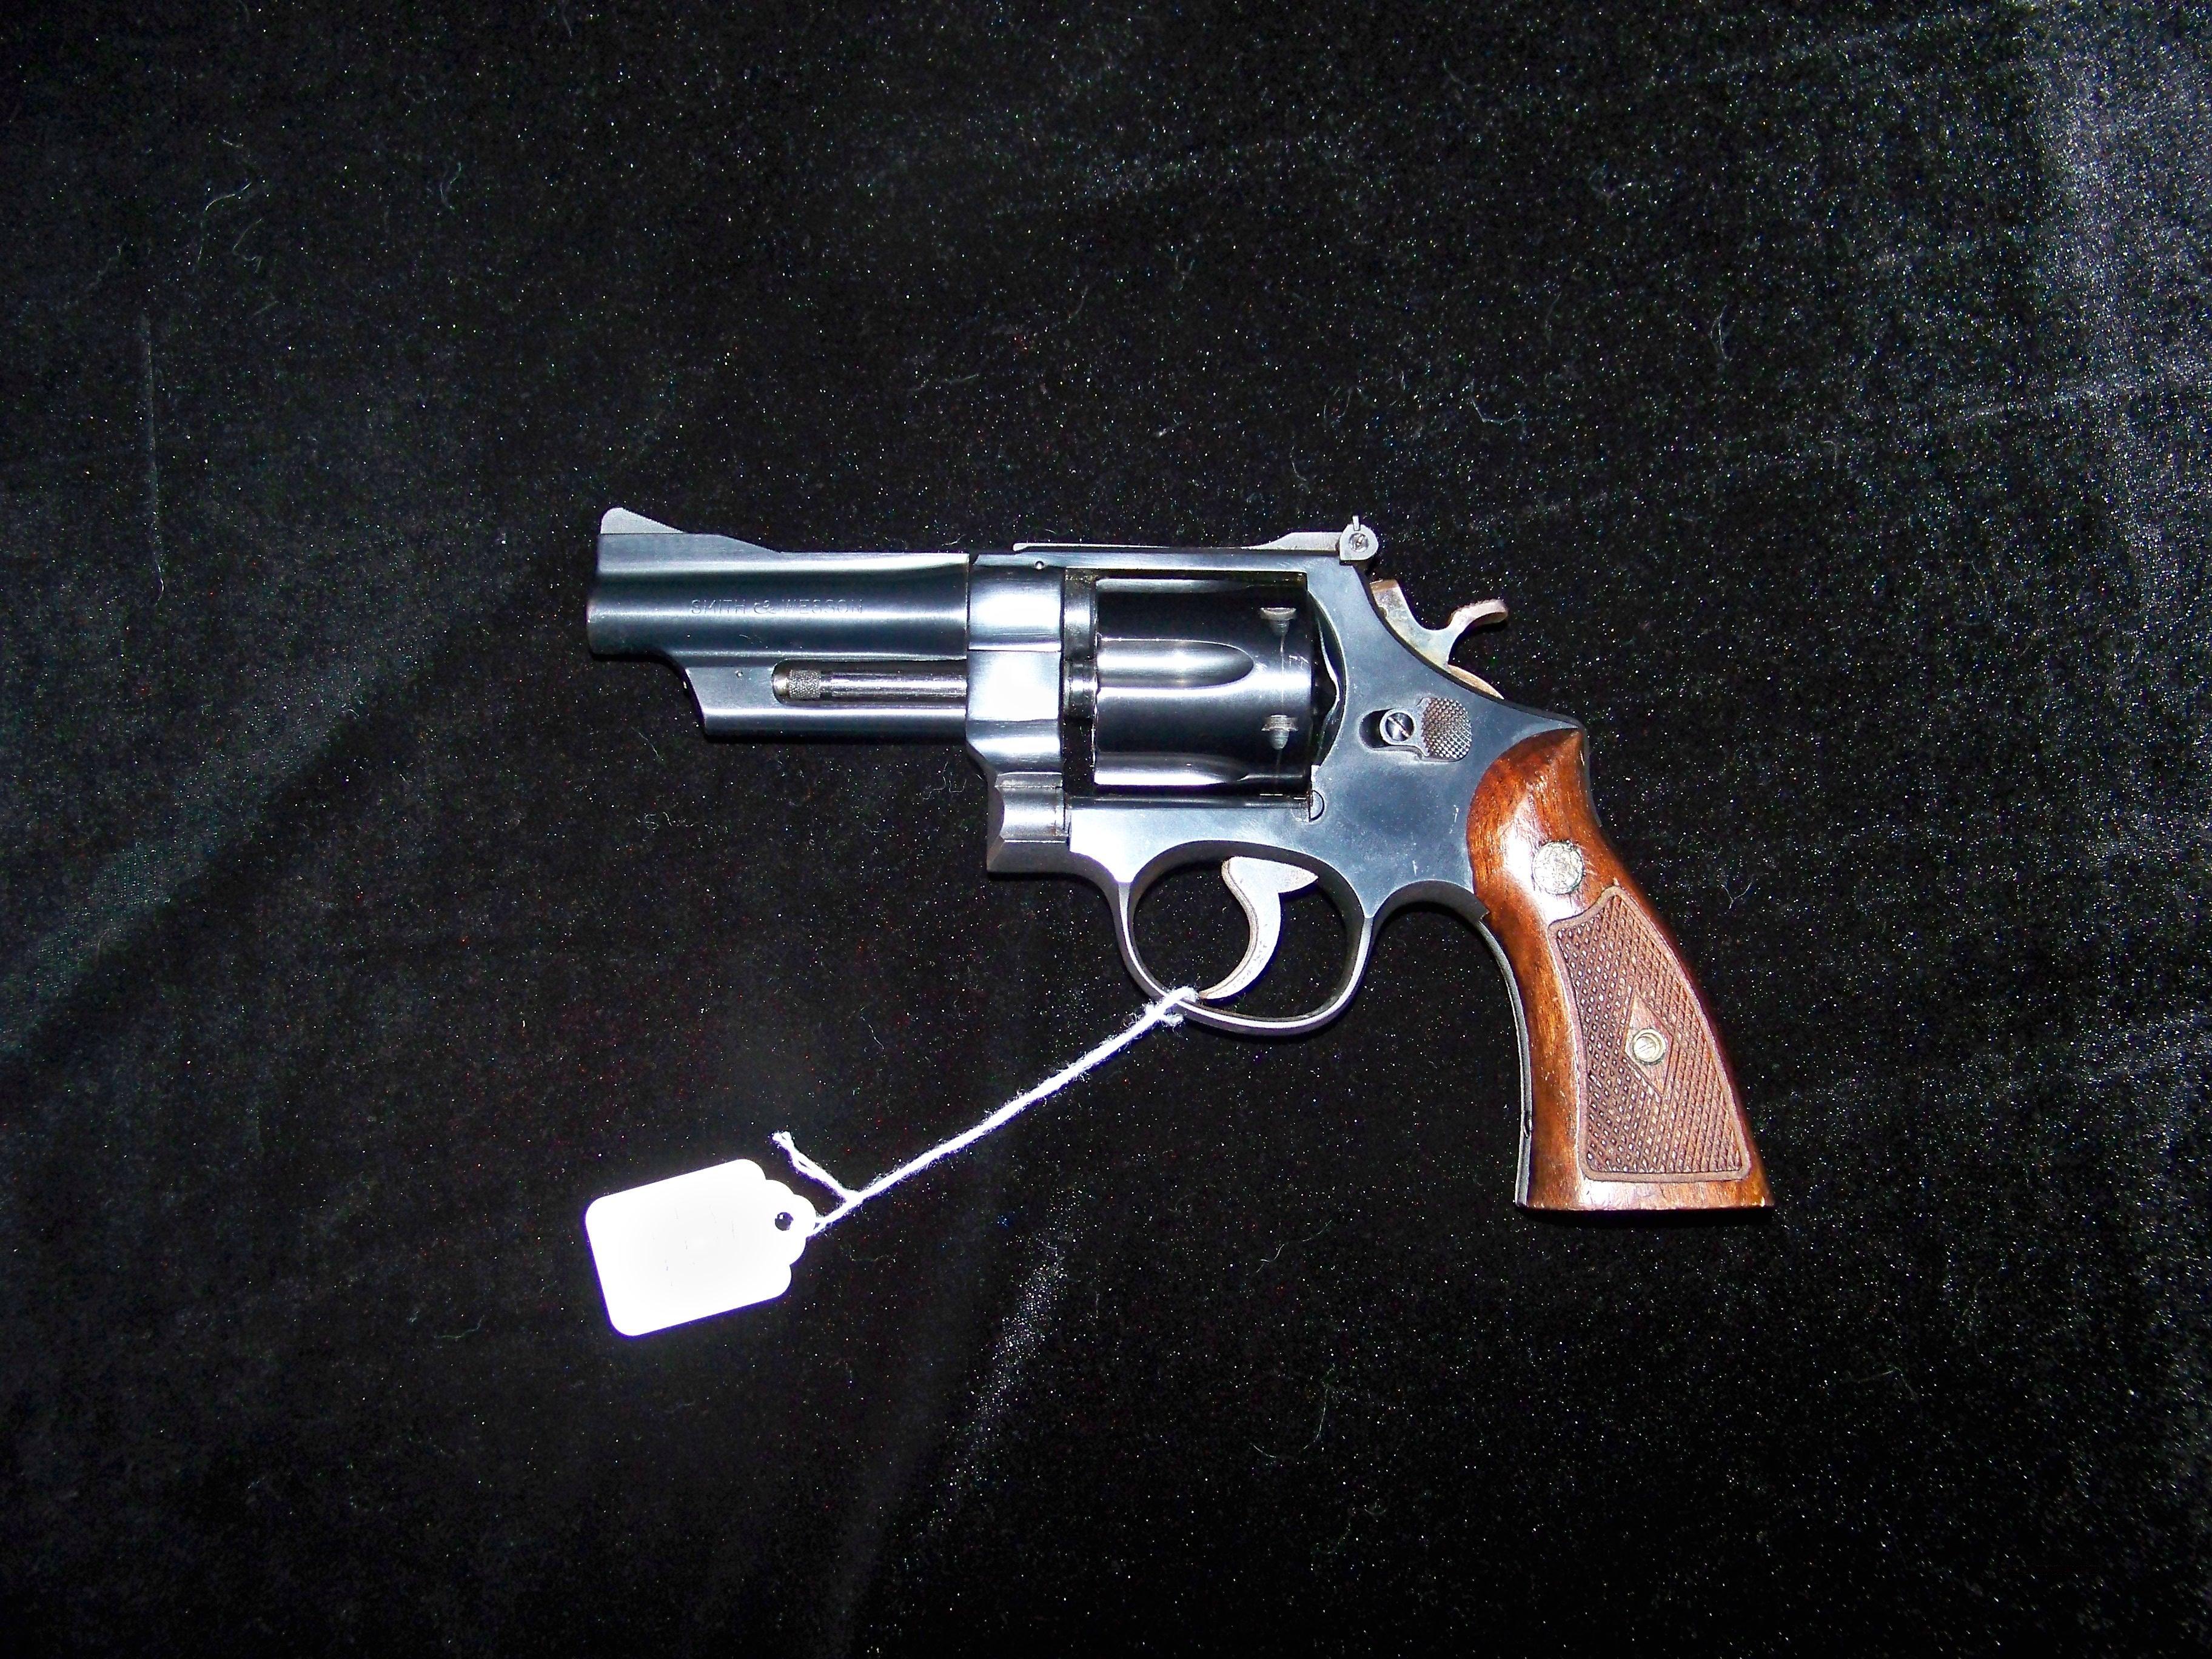 SMITH & WESSON MODEL 28 HIGHWAY PATROL  Guns > Pistols > Smith & Wesson Revolvers > Full Frame Revolver